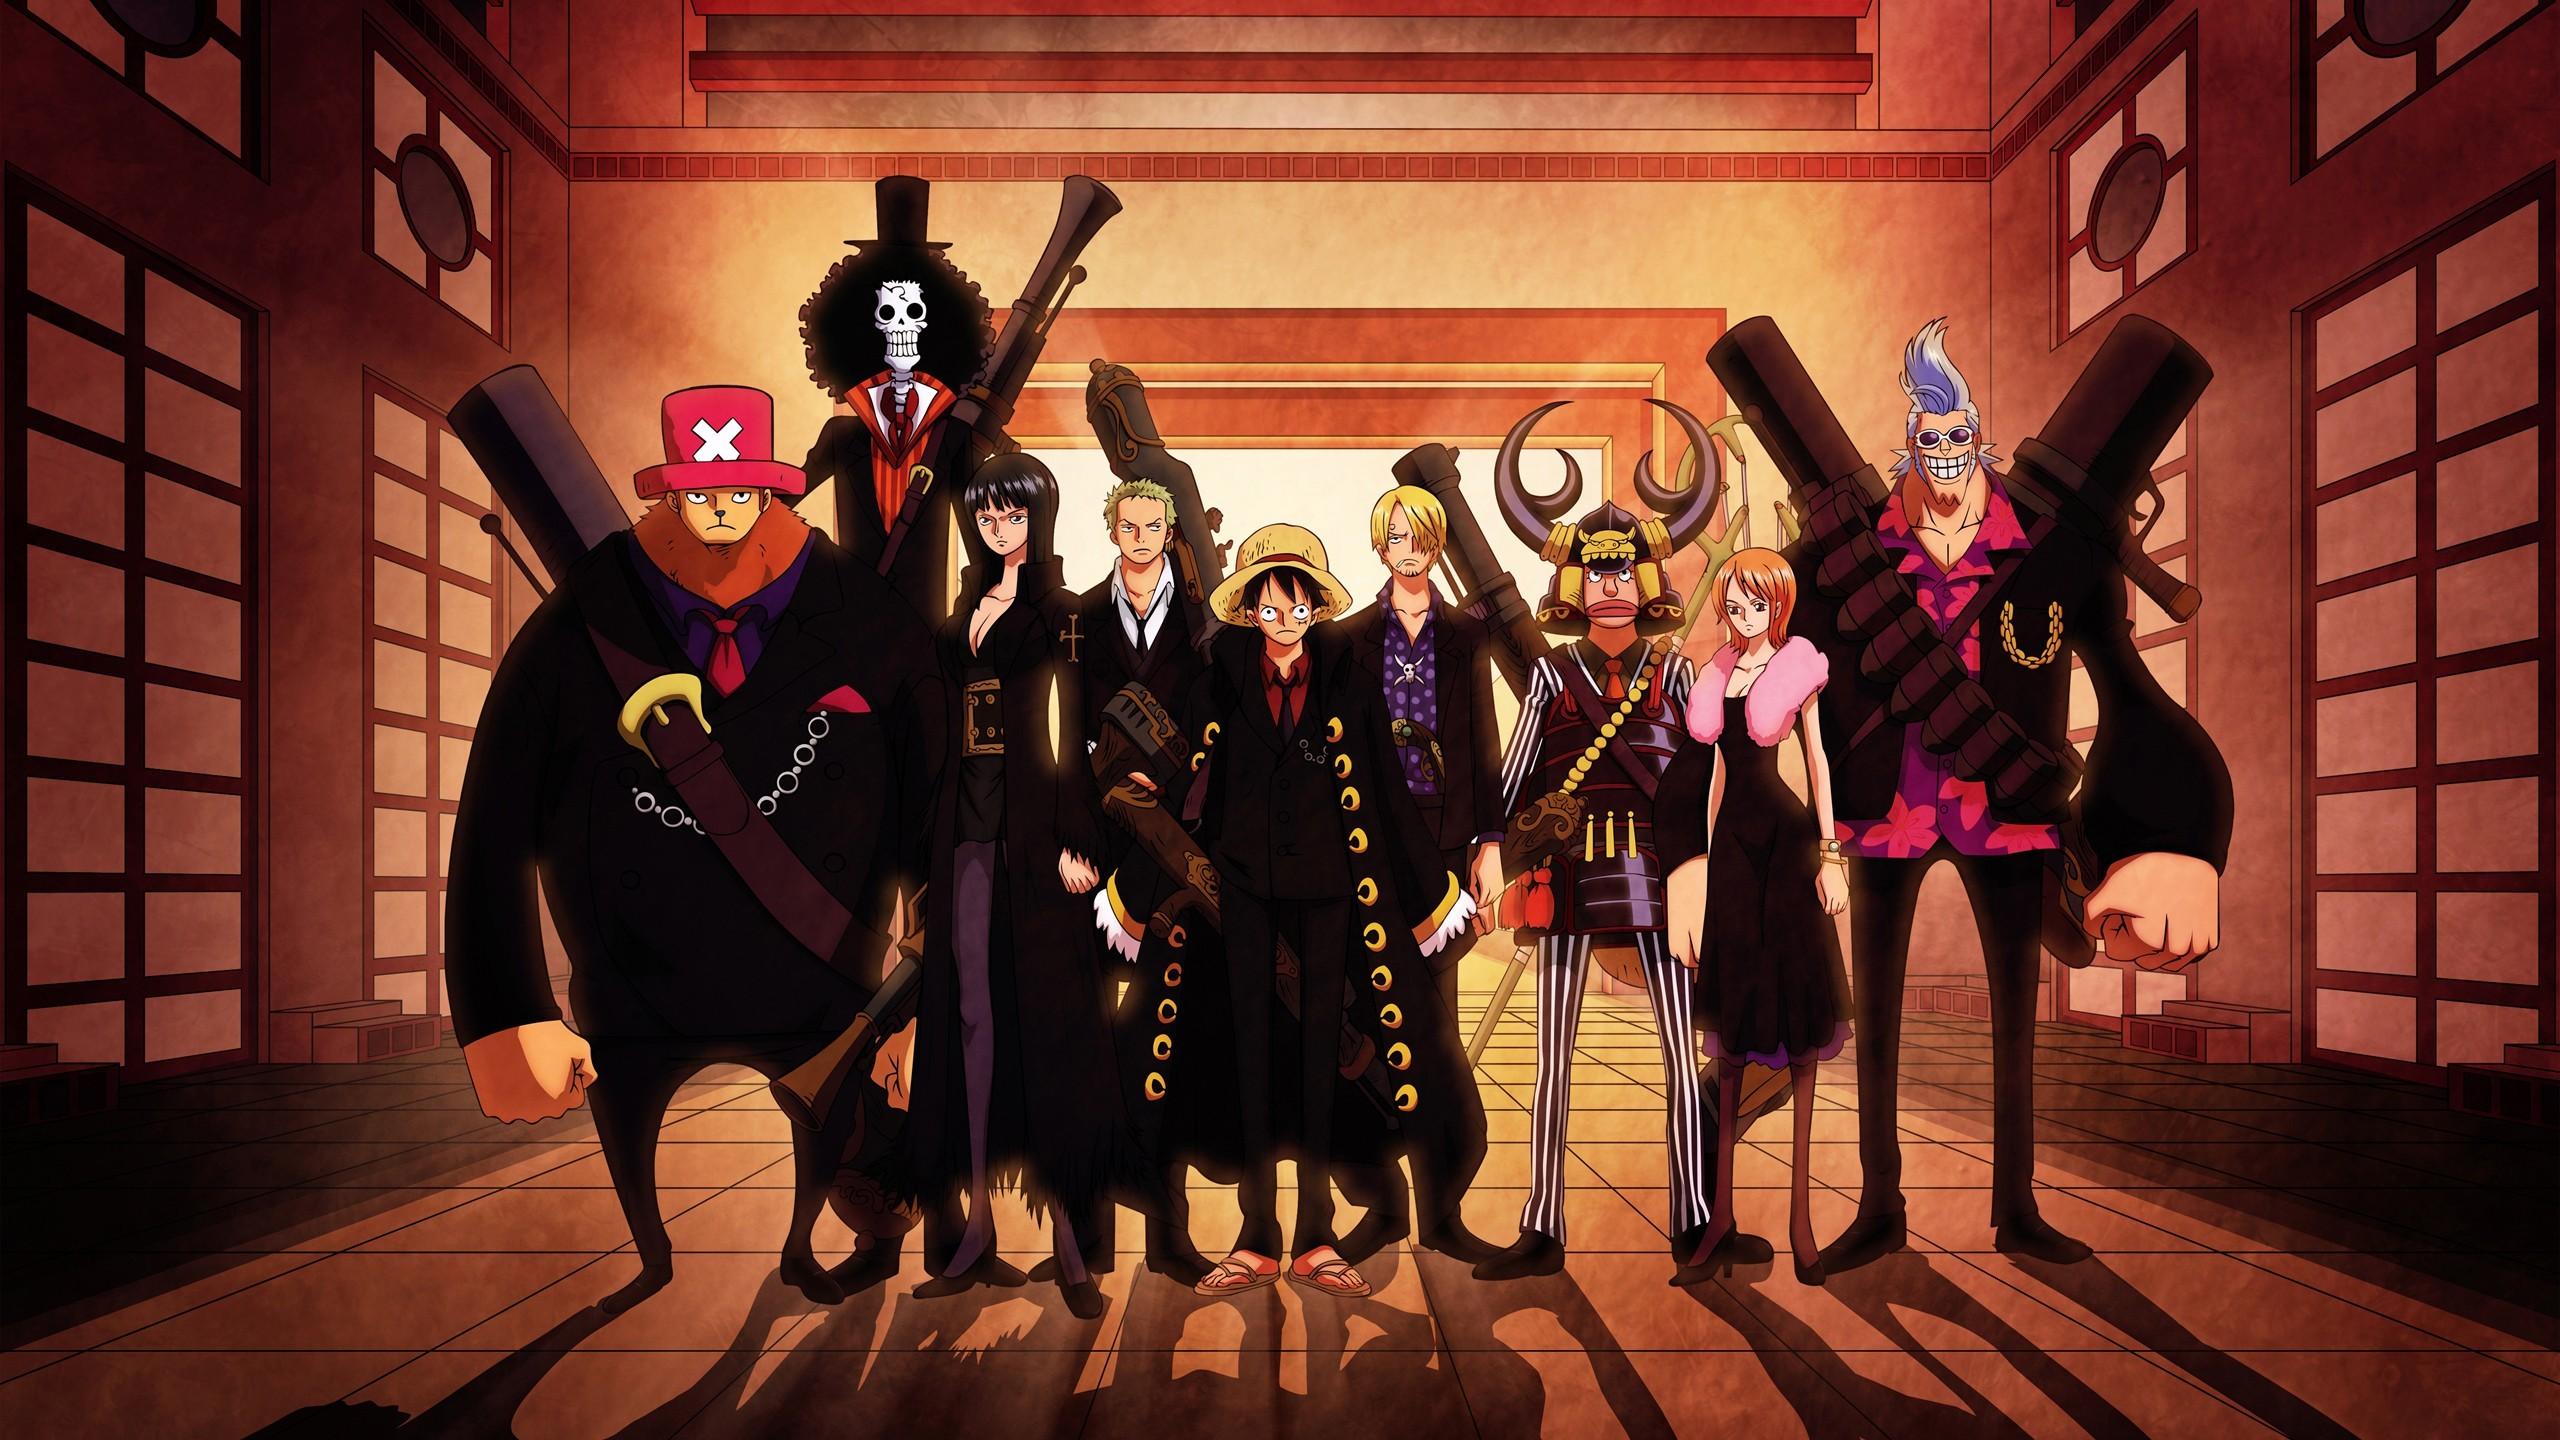 Wallpaper Anime One Piece Sanji Monkey D Luffy Roronoa Zoro